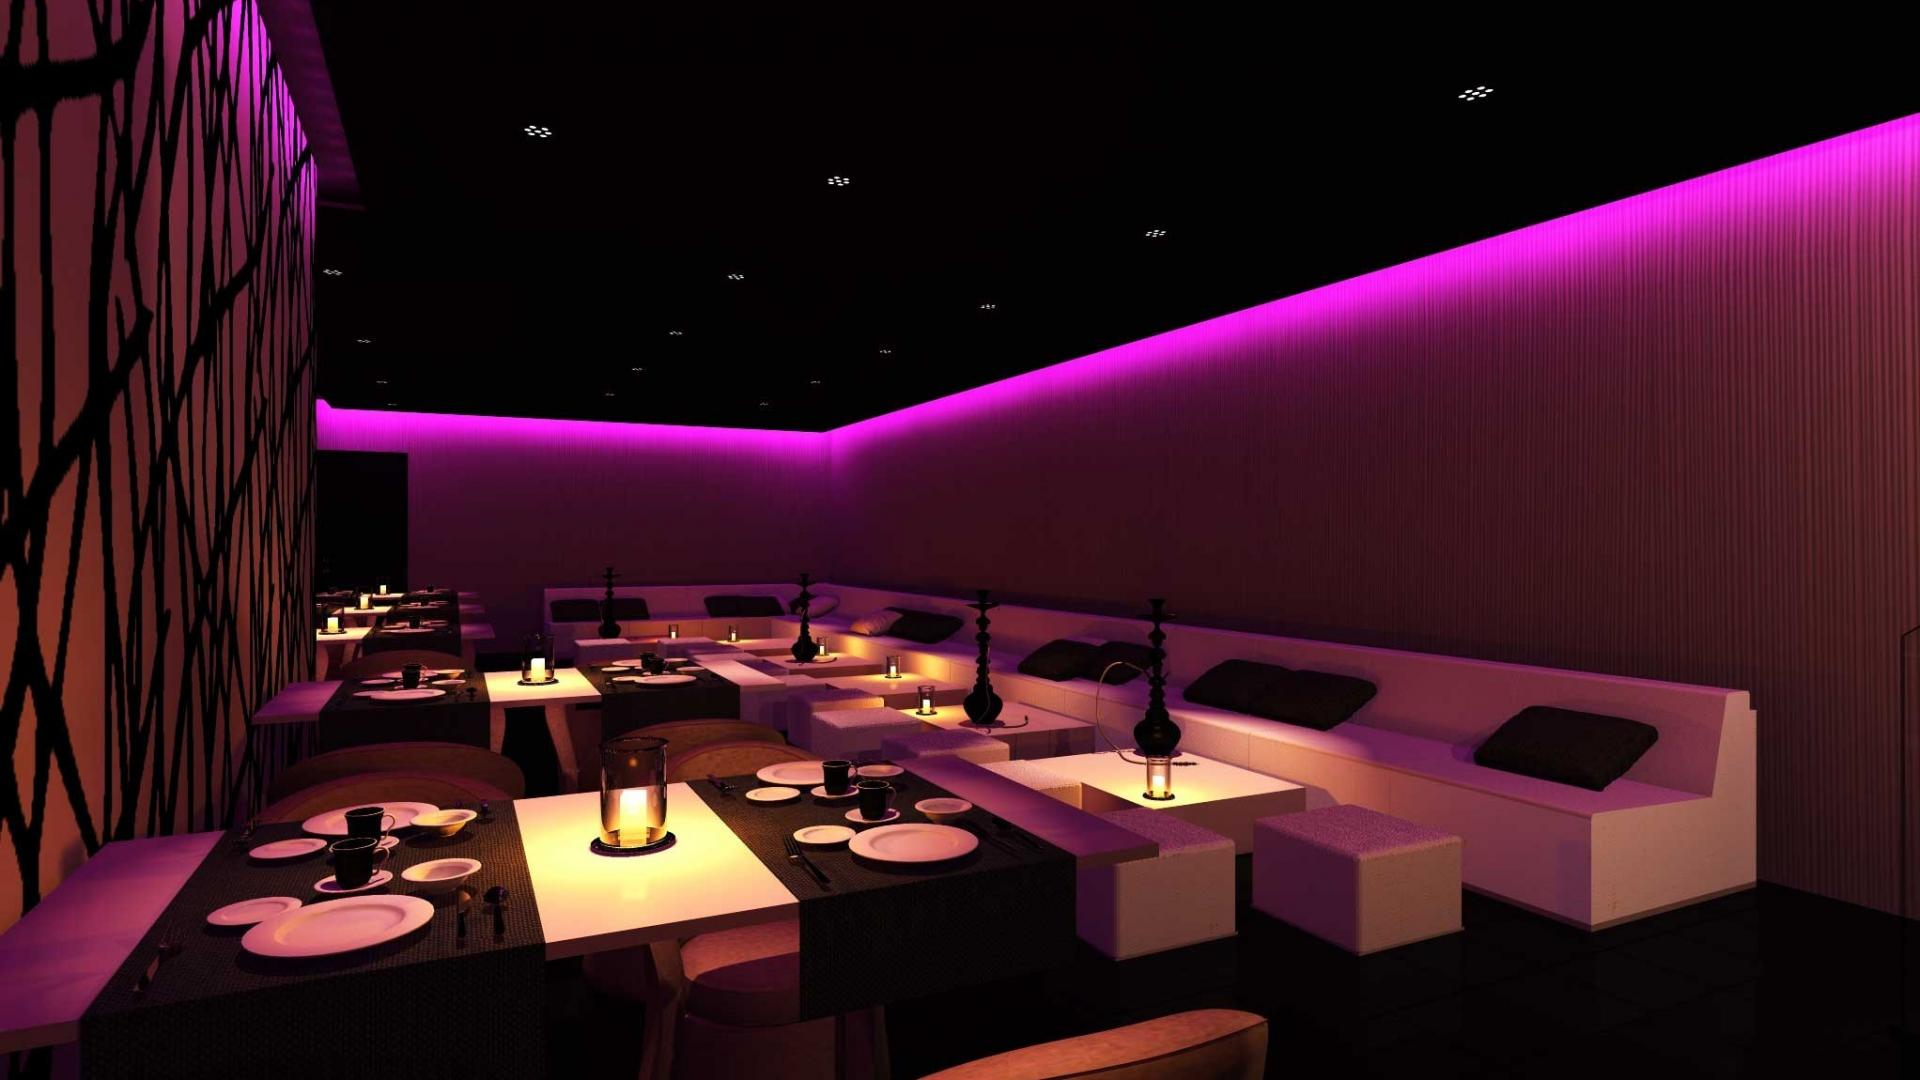 Night club wallpaper wallpapersafari for Lounge designs